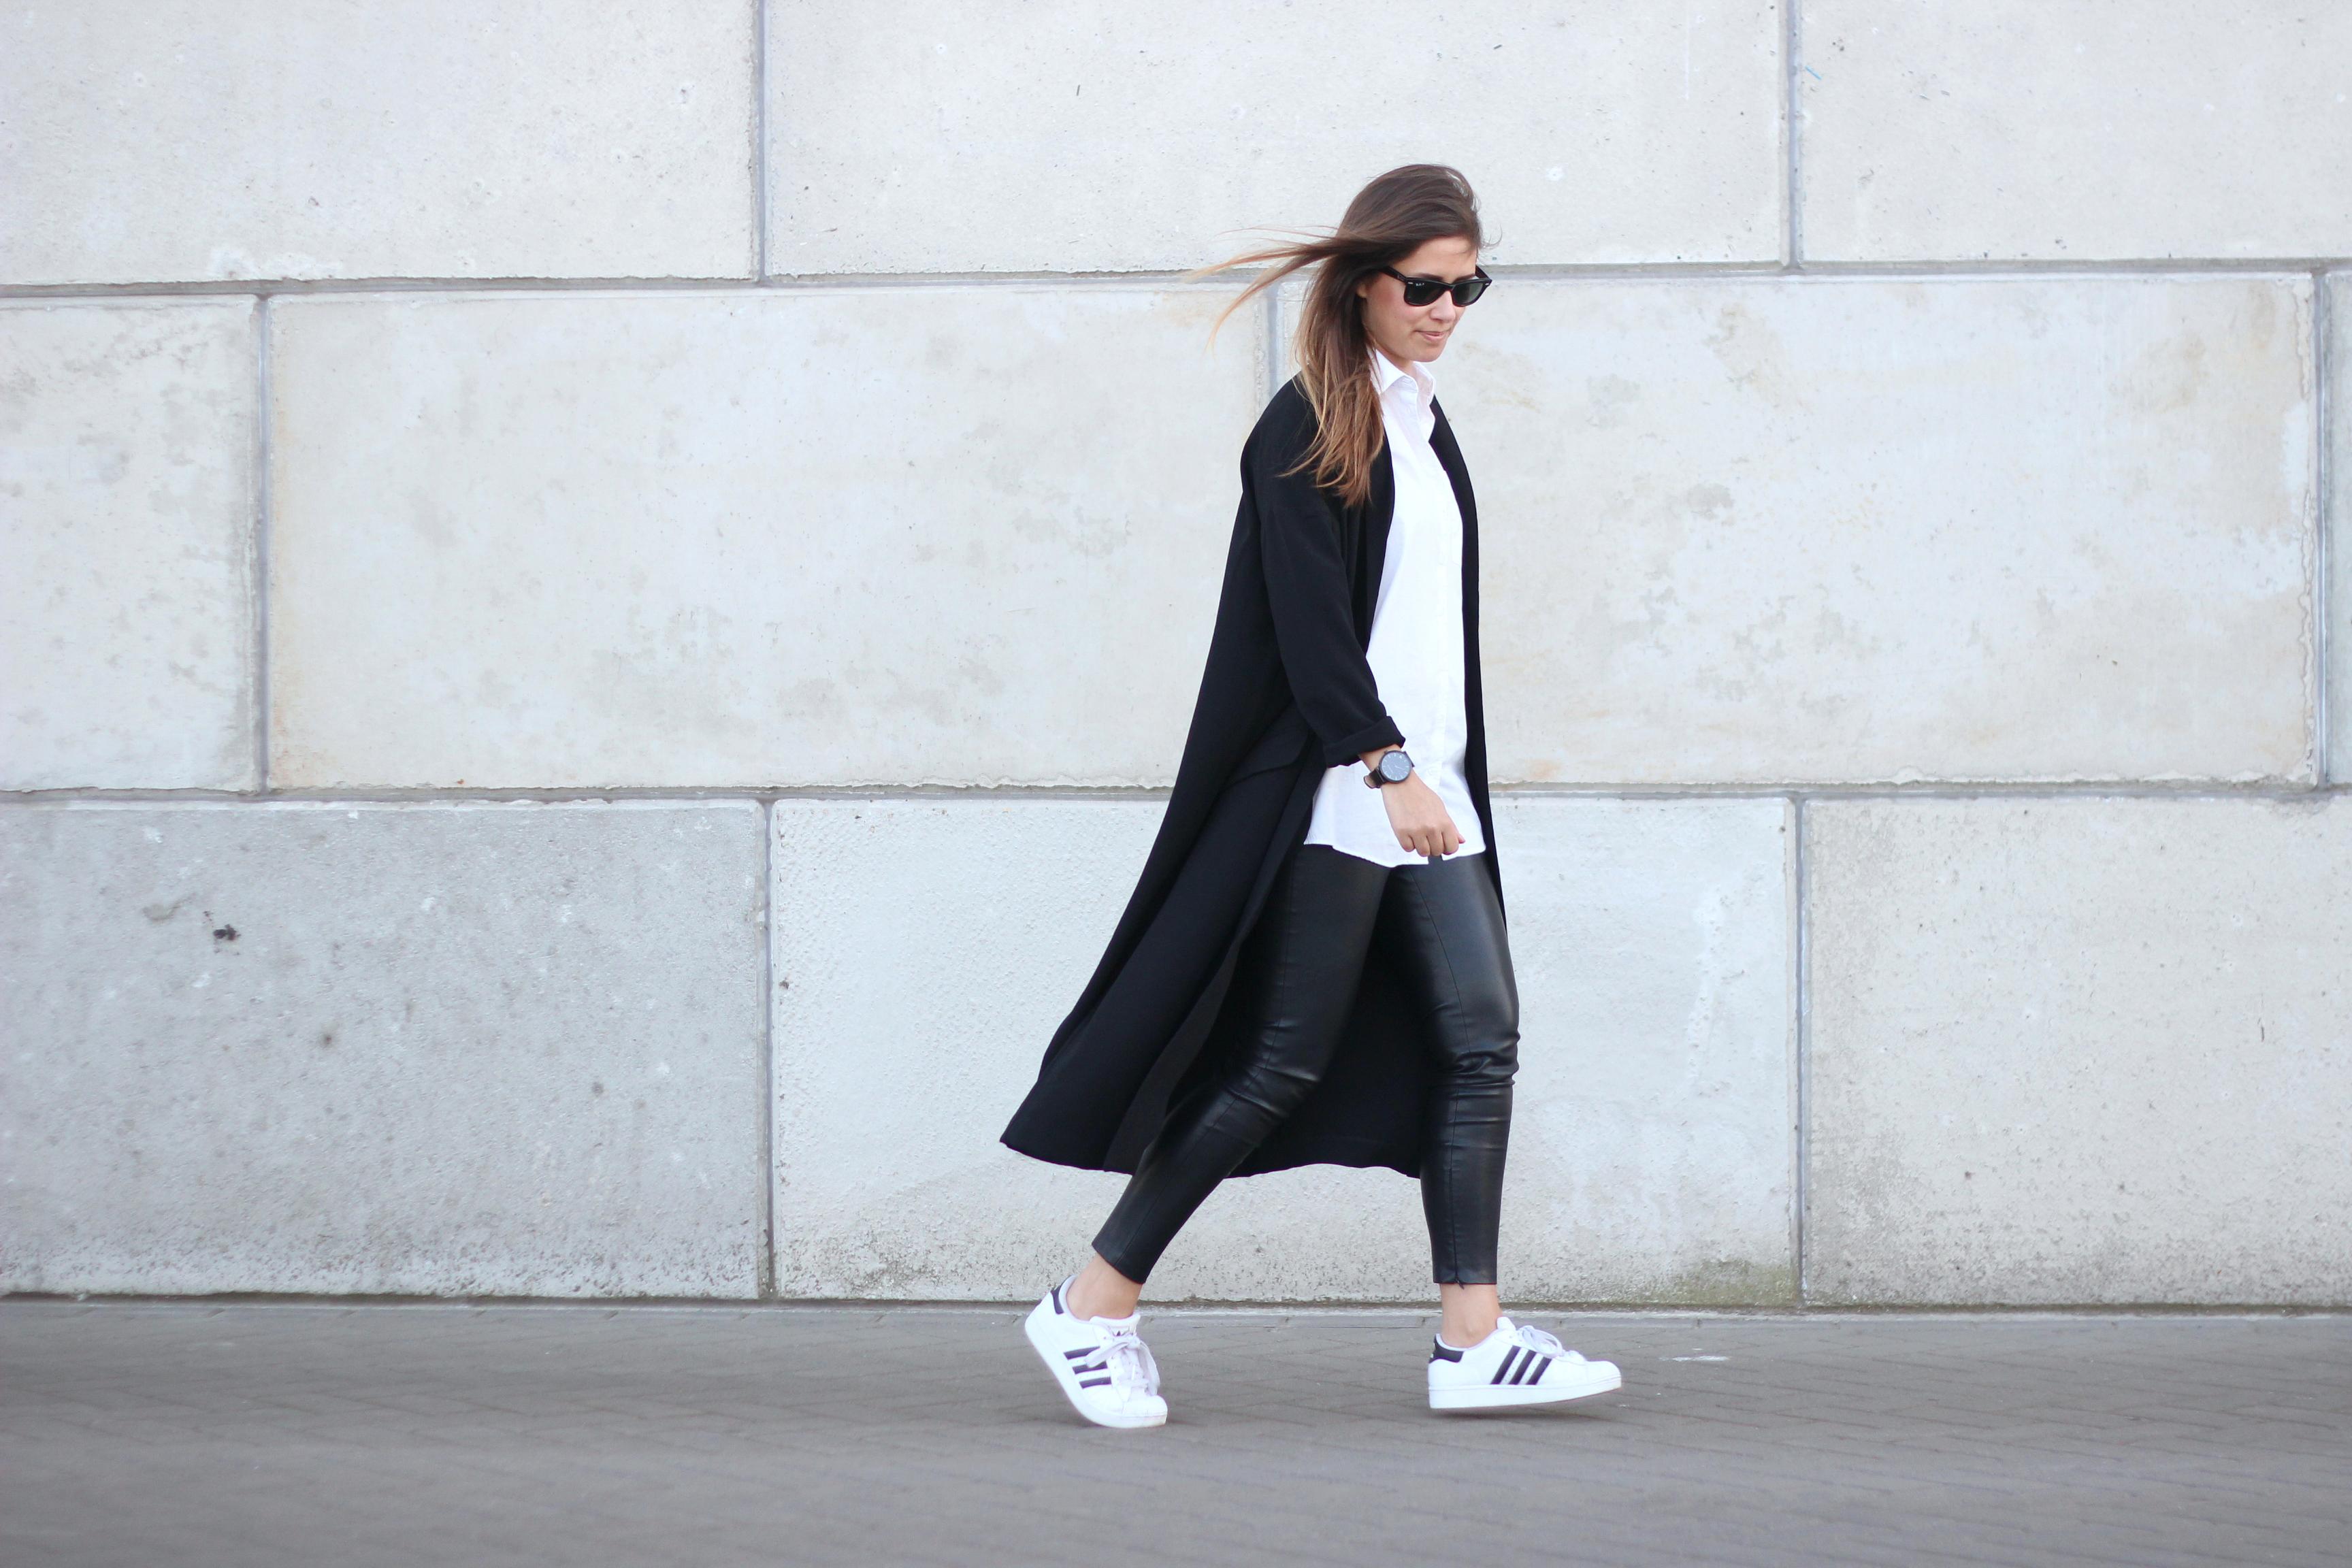 Monochrome Fashion Trend, Spring/Summer 2014 - Just The Design